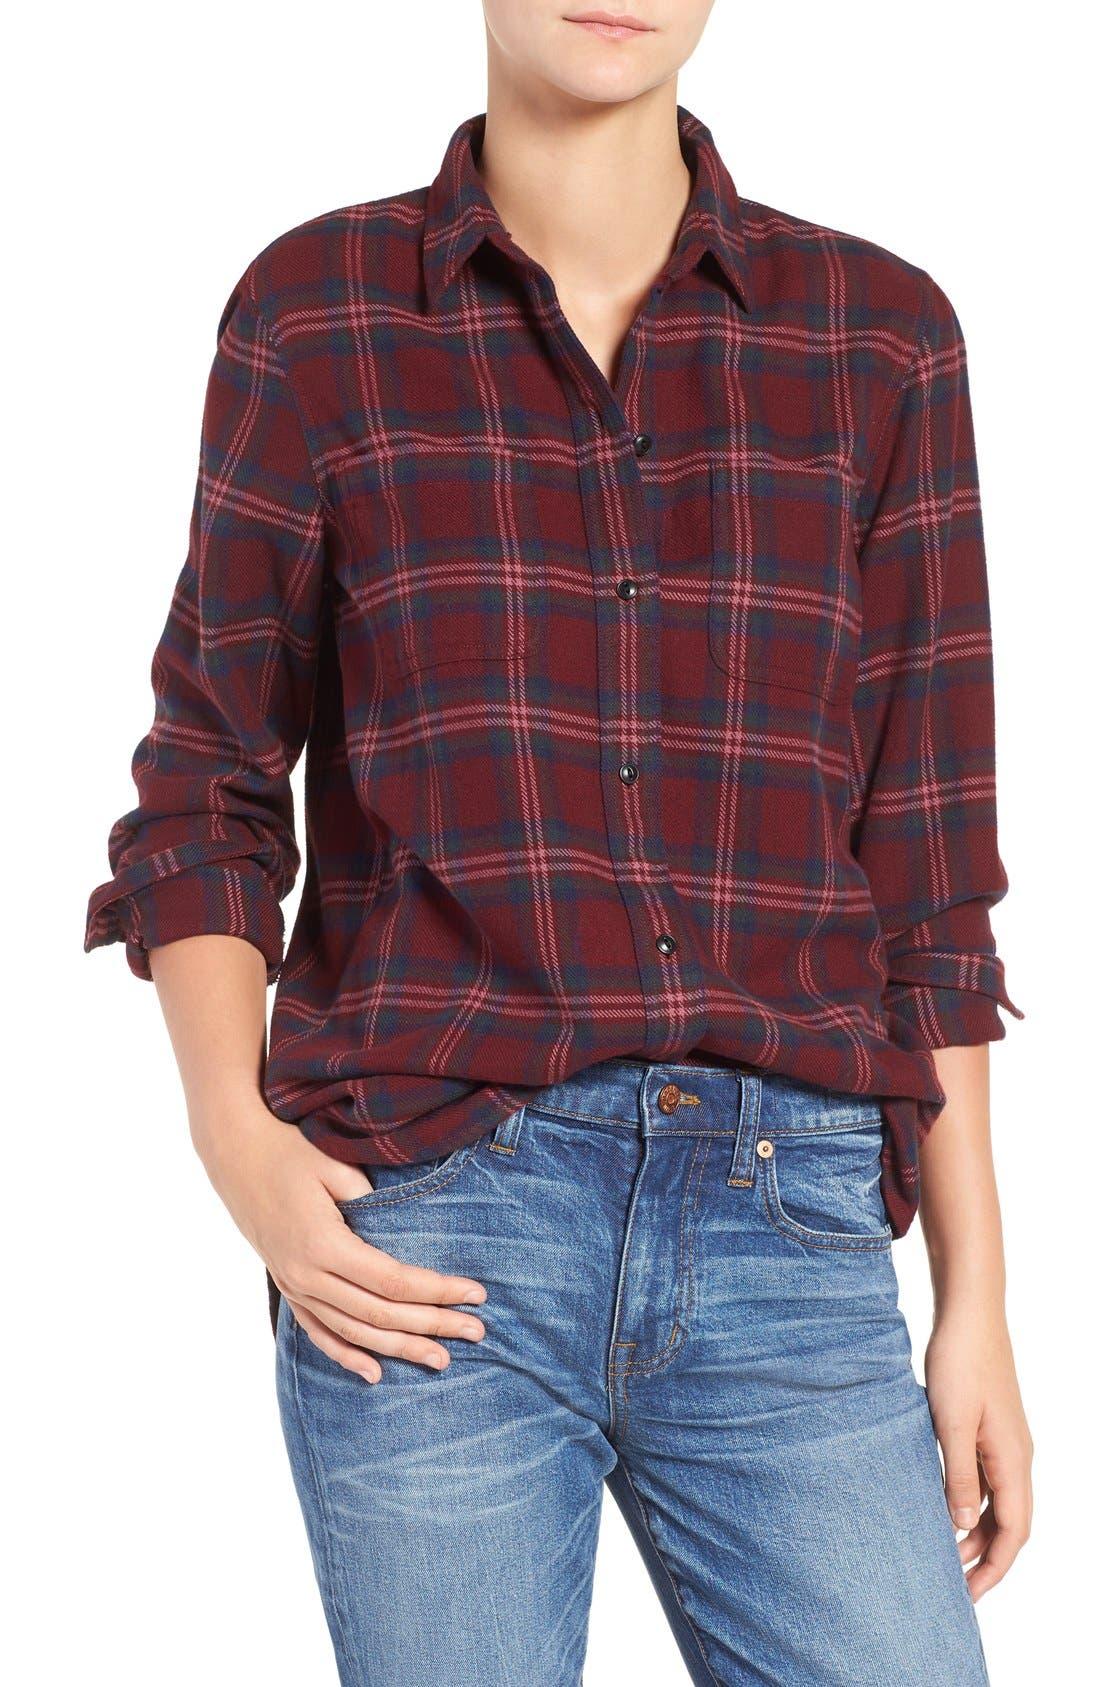 Alternate Image 1 Selected - Madewell Shrunken Boyfriend Shirt